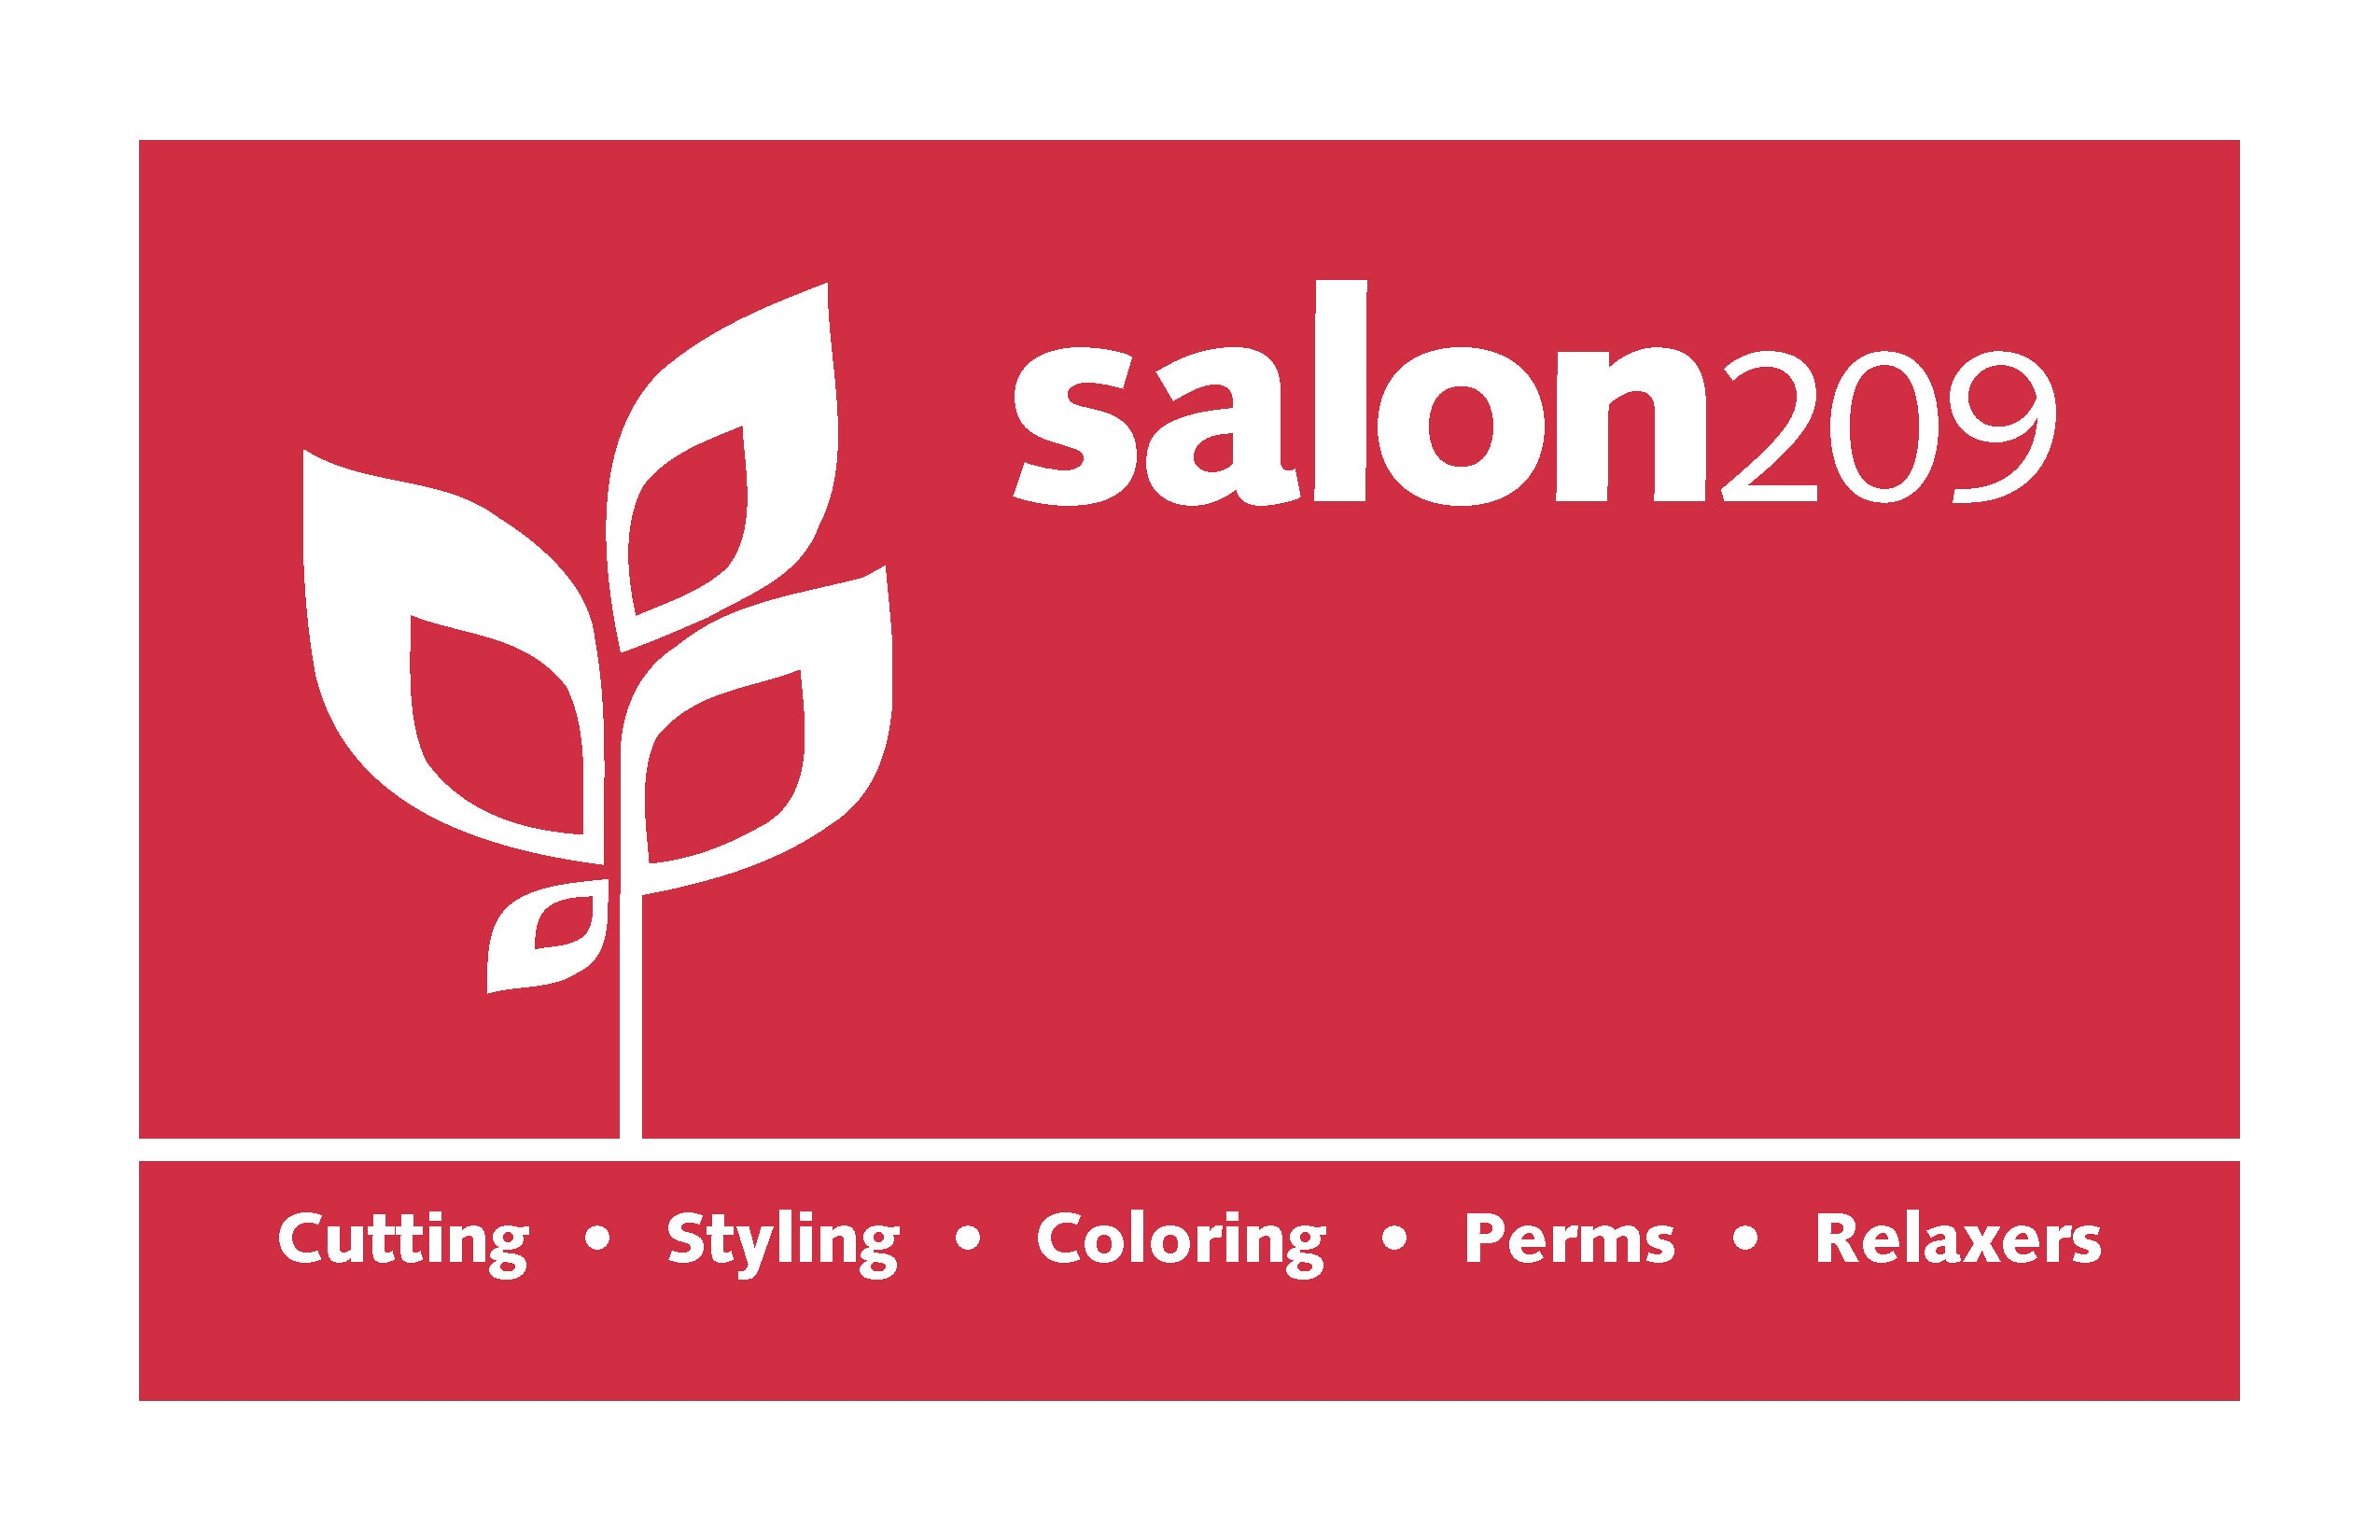 Salon 209 image 1